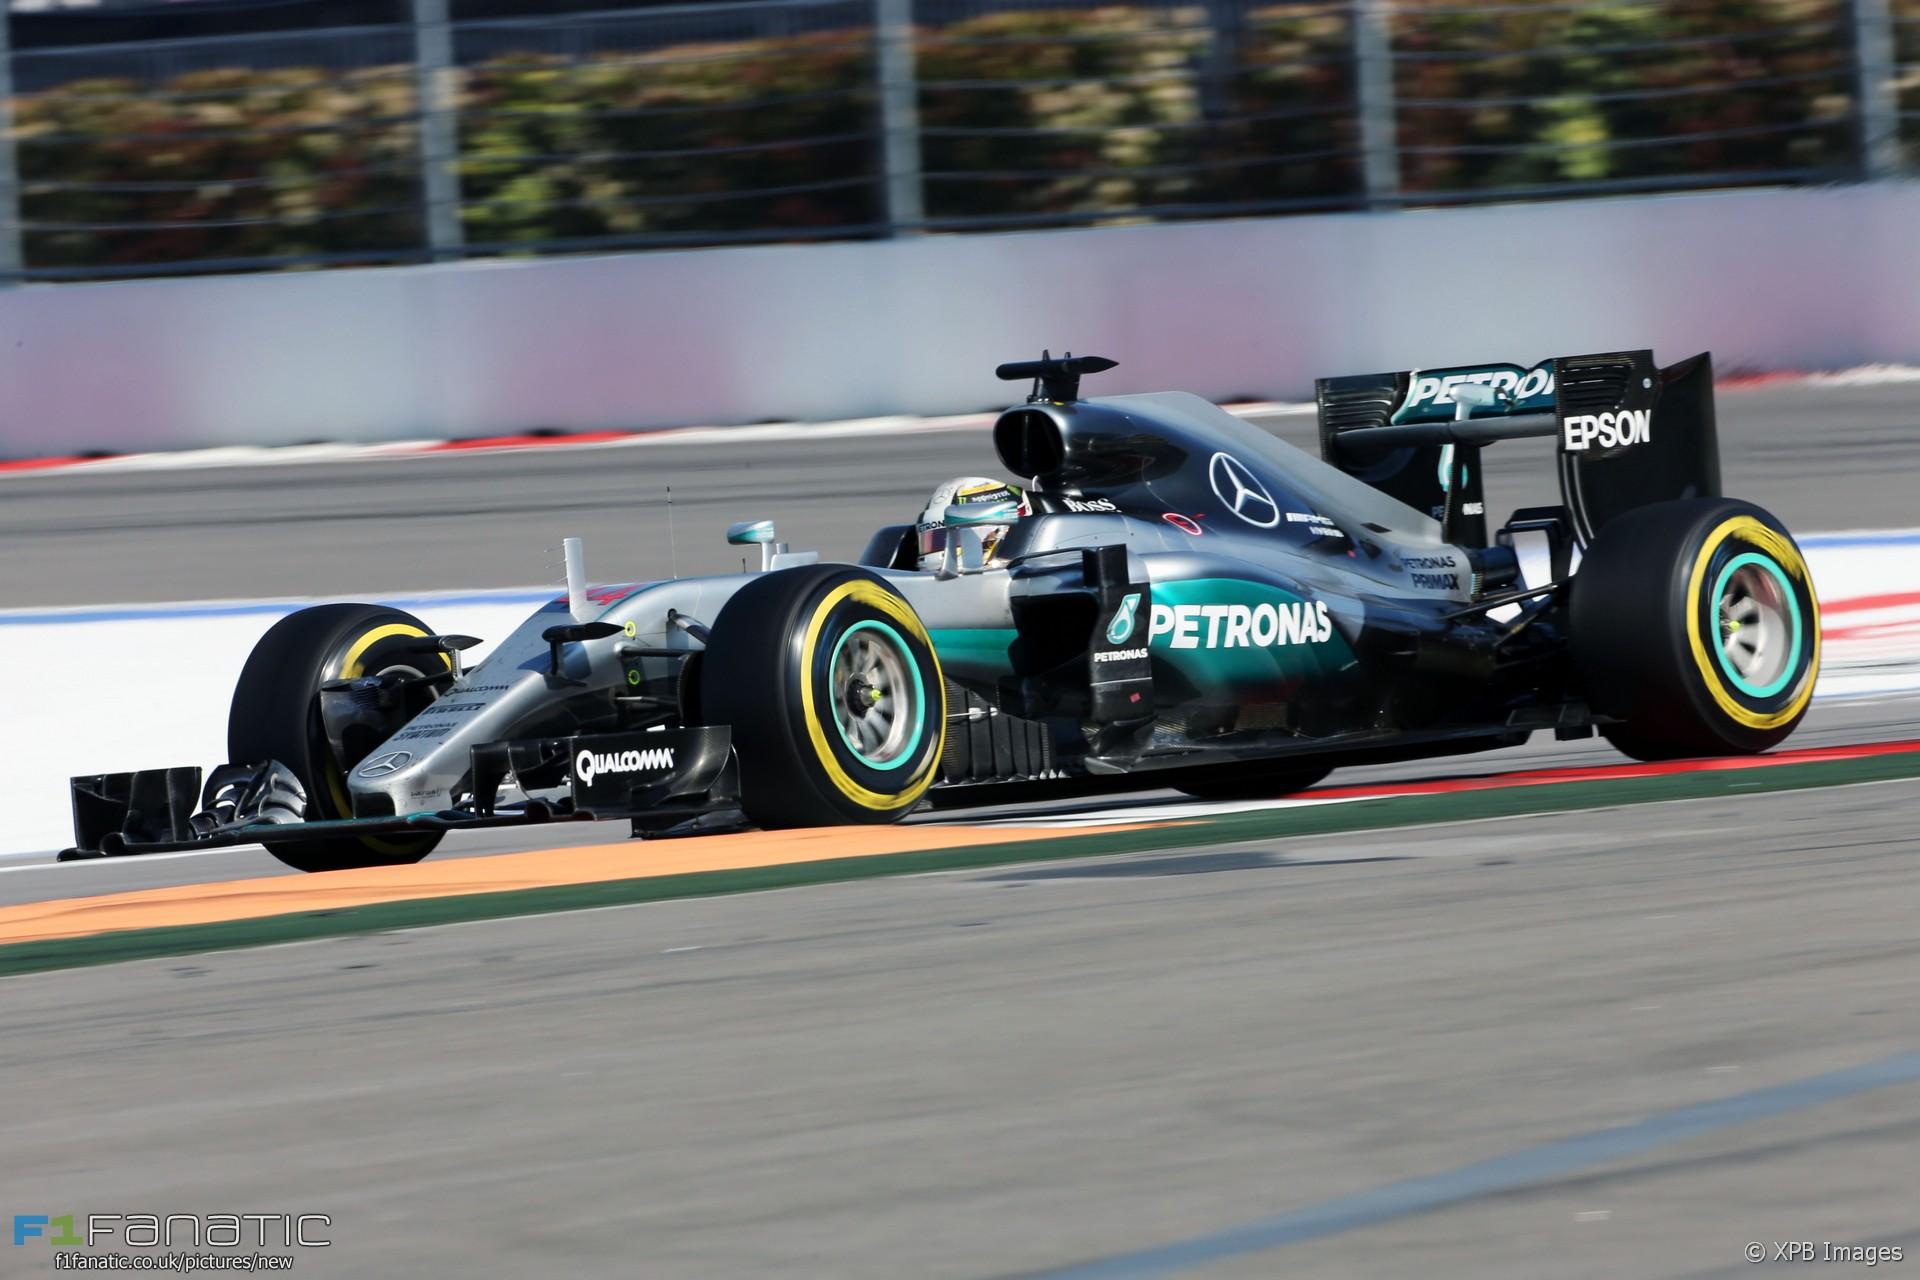 Lewis Hamilton, Mercedes, Sochi Autodrom, 2016